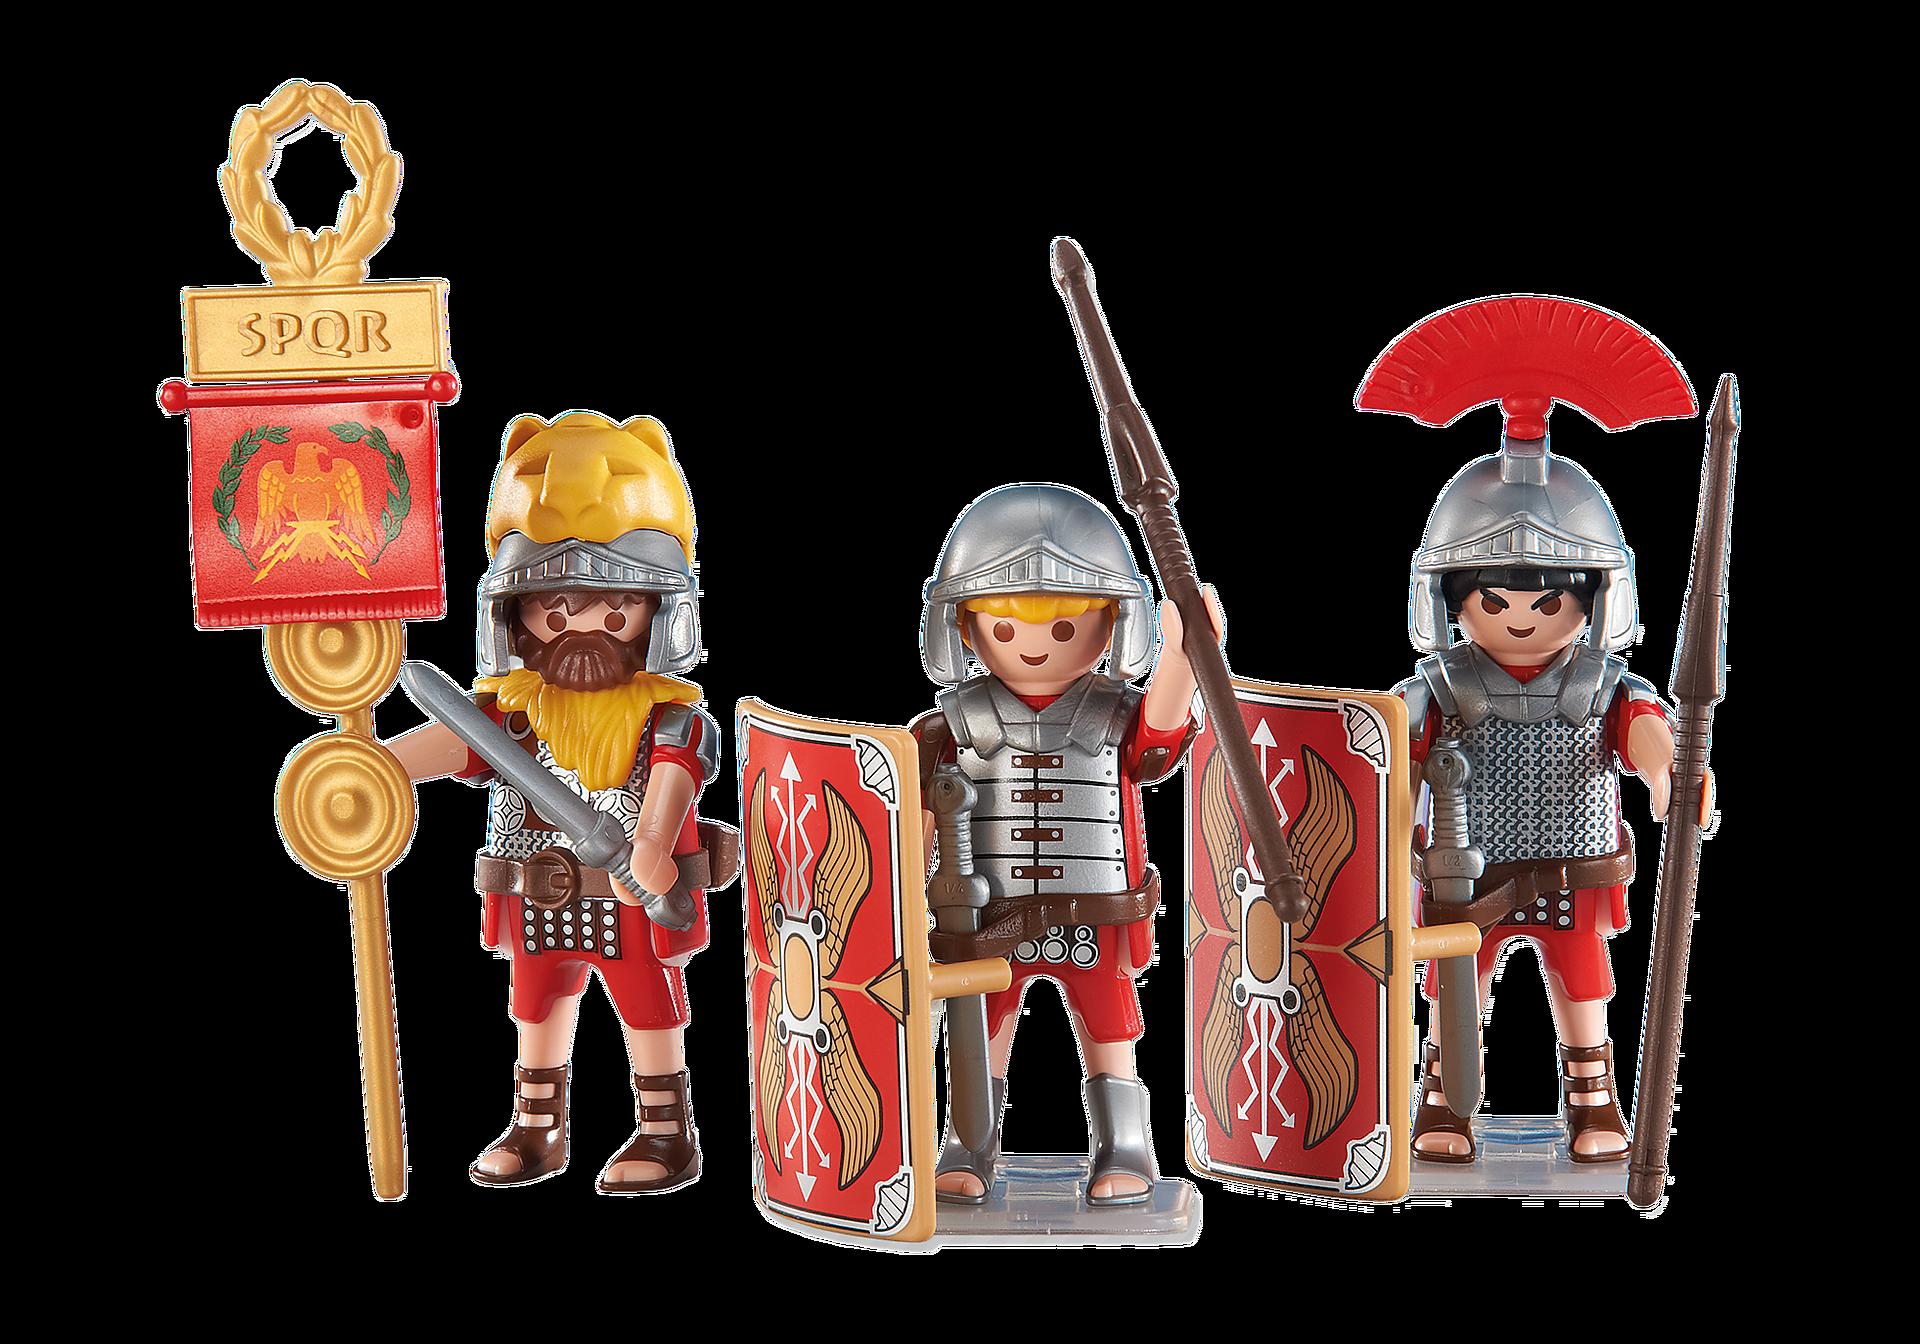 http://media.playmobil.com/i/playmobil/6490_product_detail/3 Romeinse soldaten